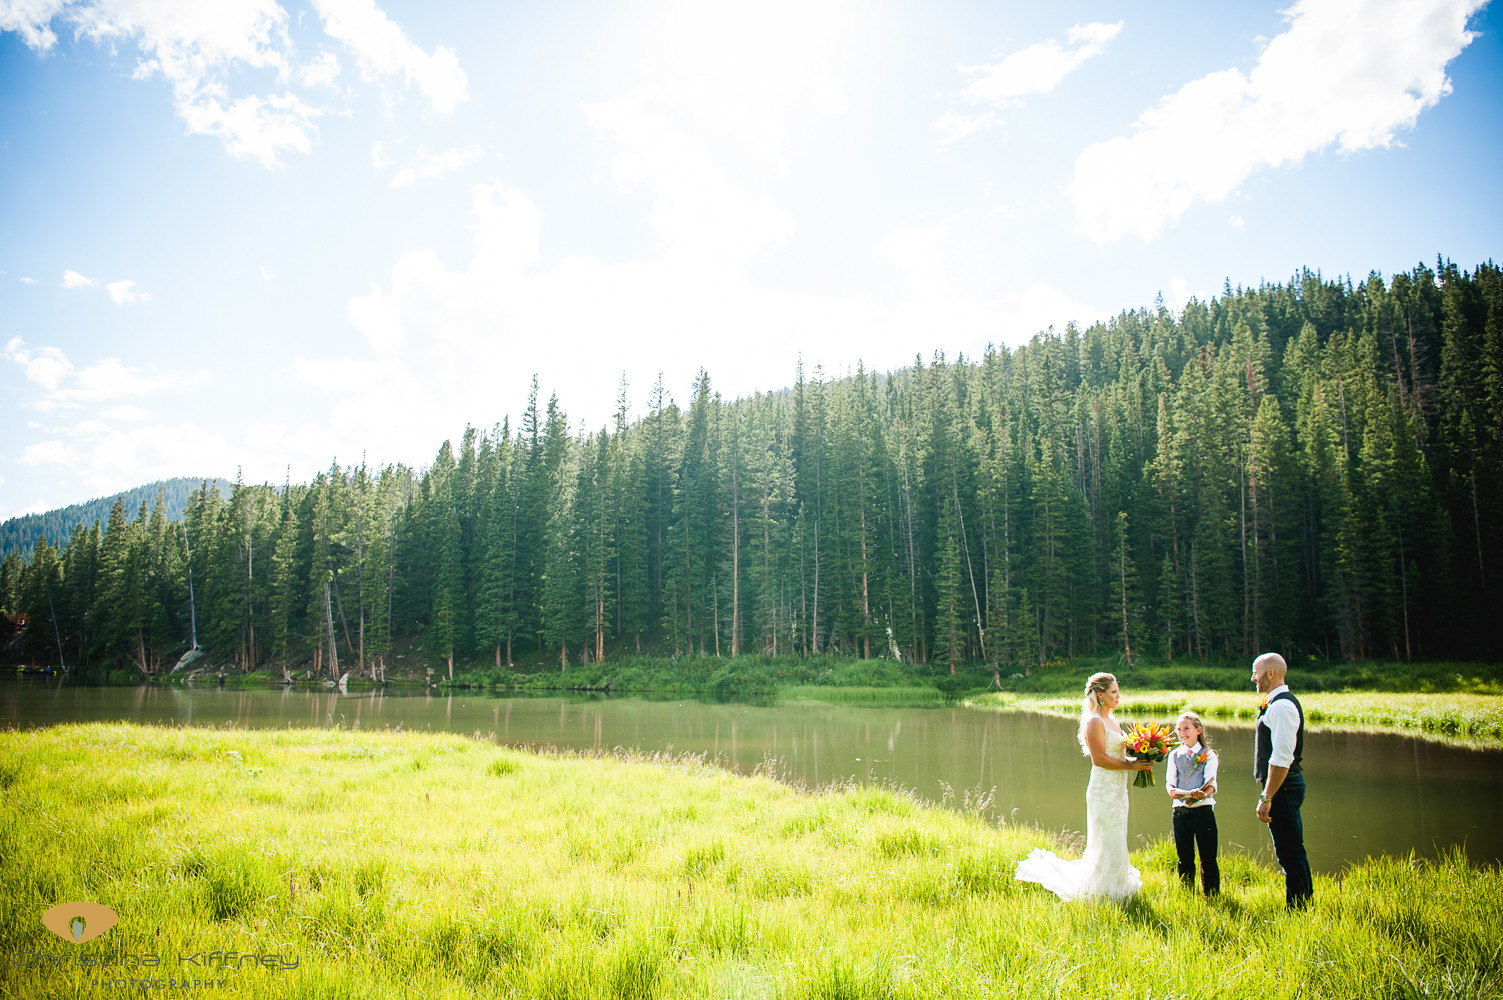 ckp-Colorado-Family-Elopement-0019.jpg